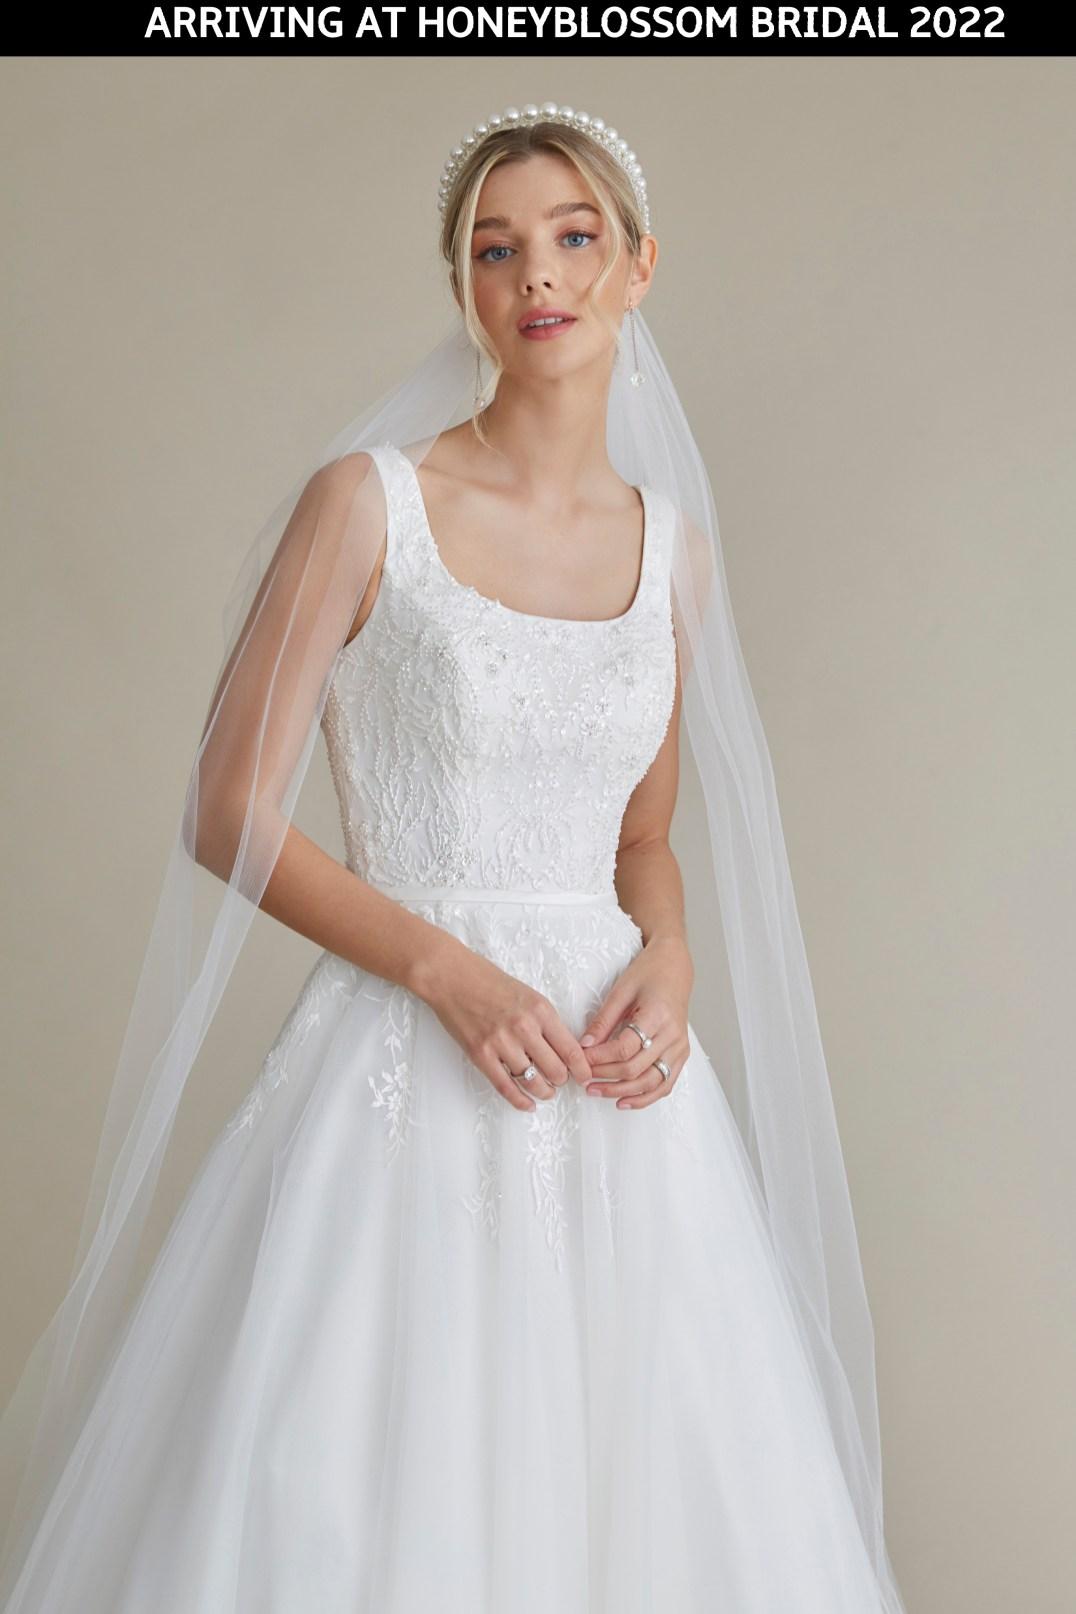 MiaMia Elle wedding dress arriving soon to Honeyblossom Bridal